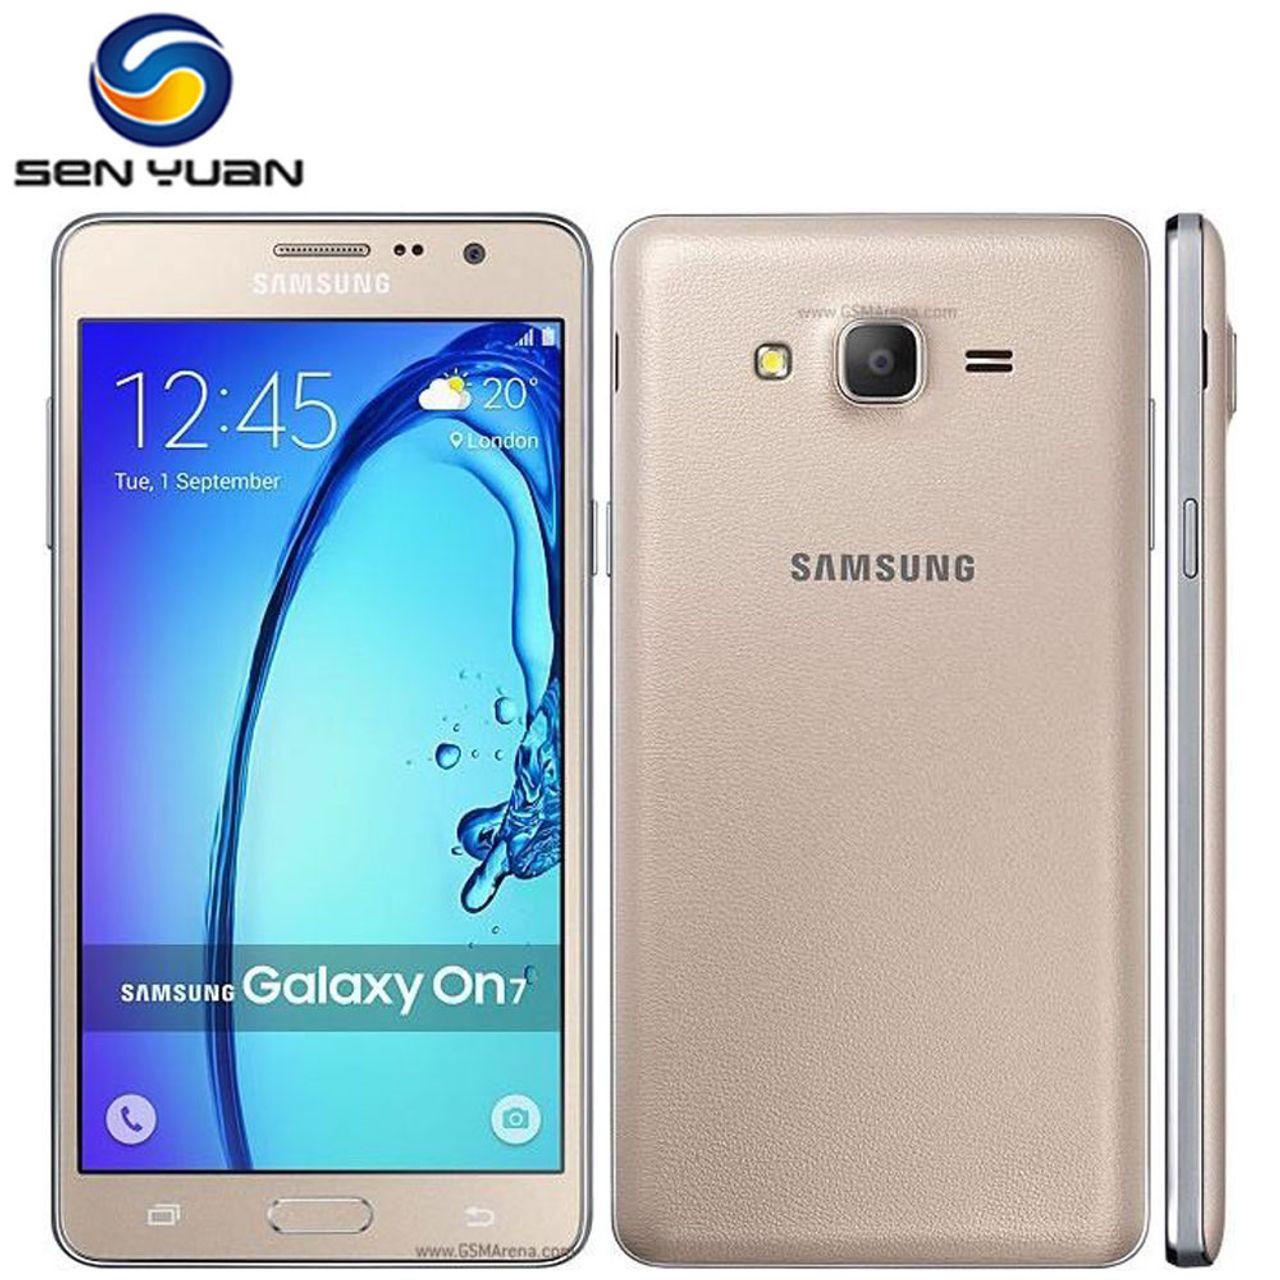 Refurbishedl Samsung Galaxy On7 G6000 Mobile Phone 8GB/16 ROM 1.5 RAM 13MP  Camera Quad Core Dual sim gold 8g